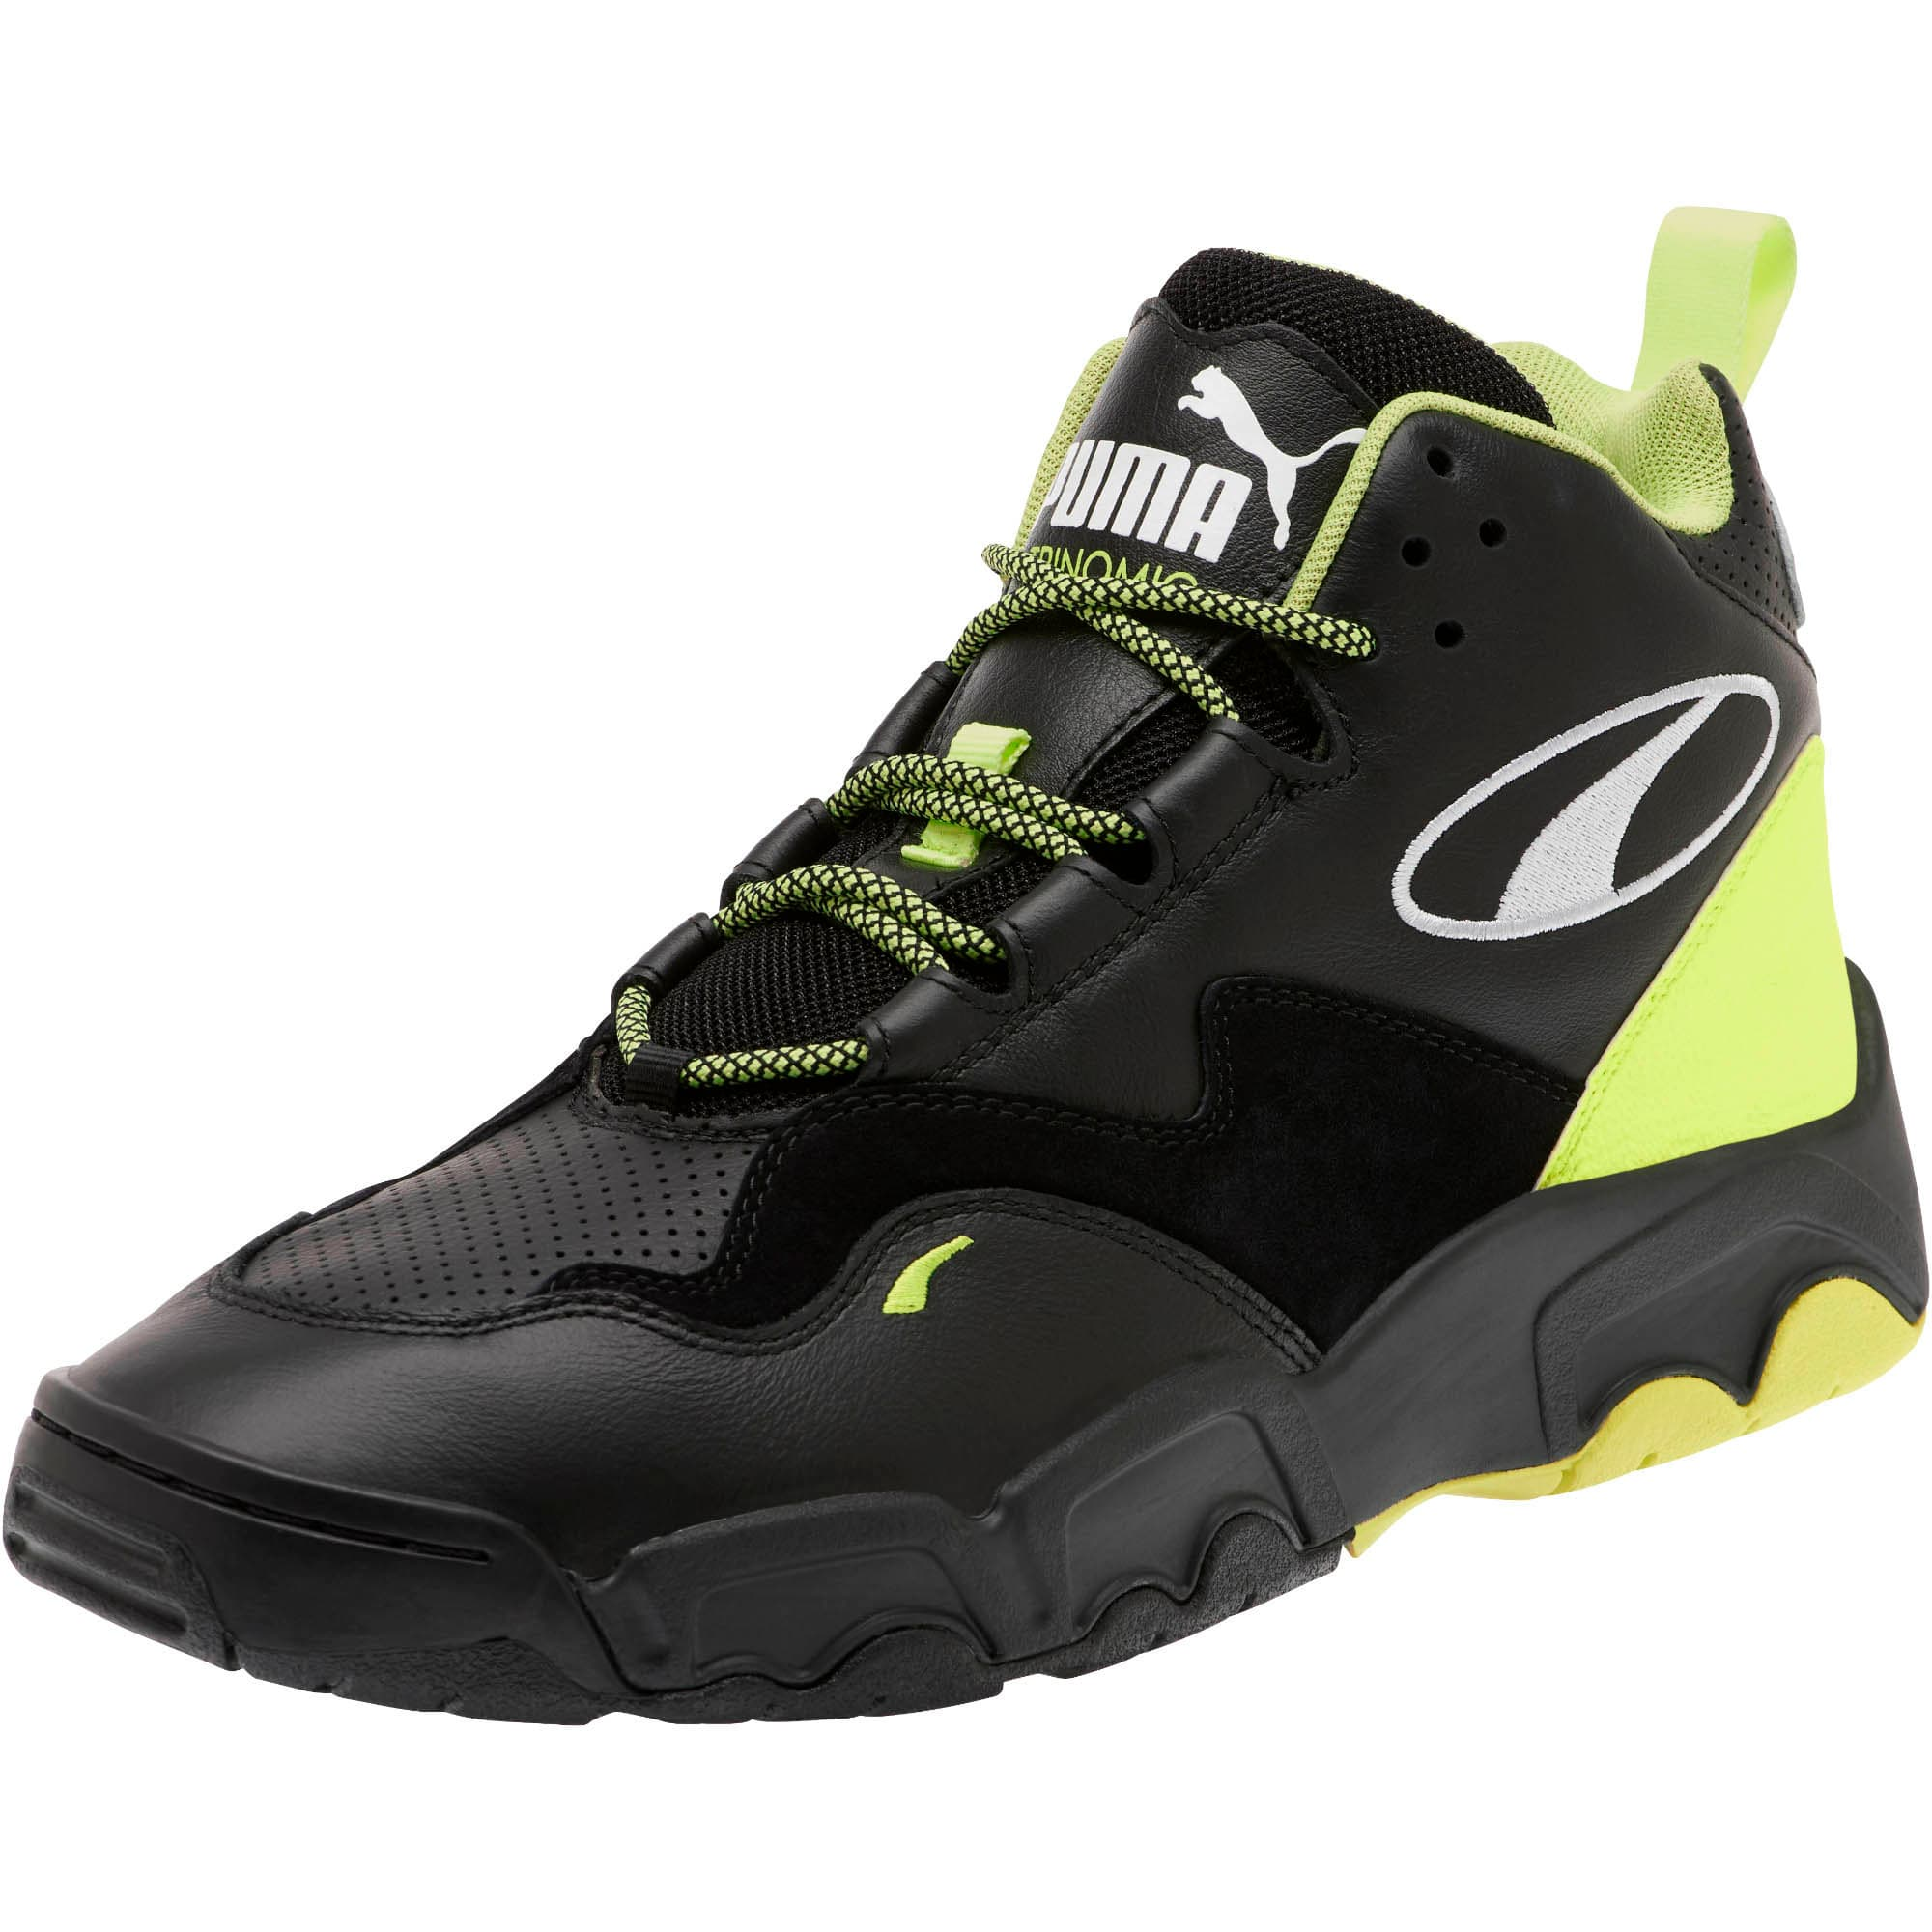 Thumbnail 1 of Source Mid Retro 2 Sneakers, Black-Fizzy Yellow-Pu White, medium